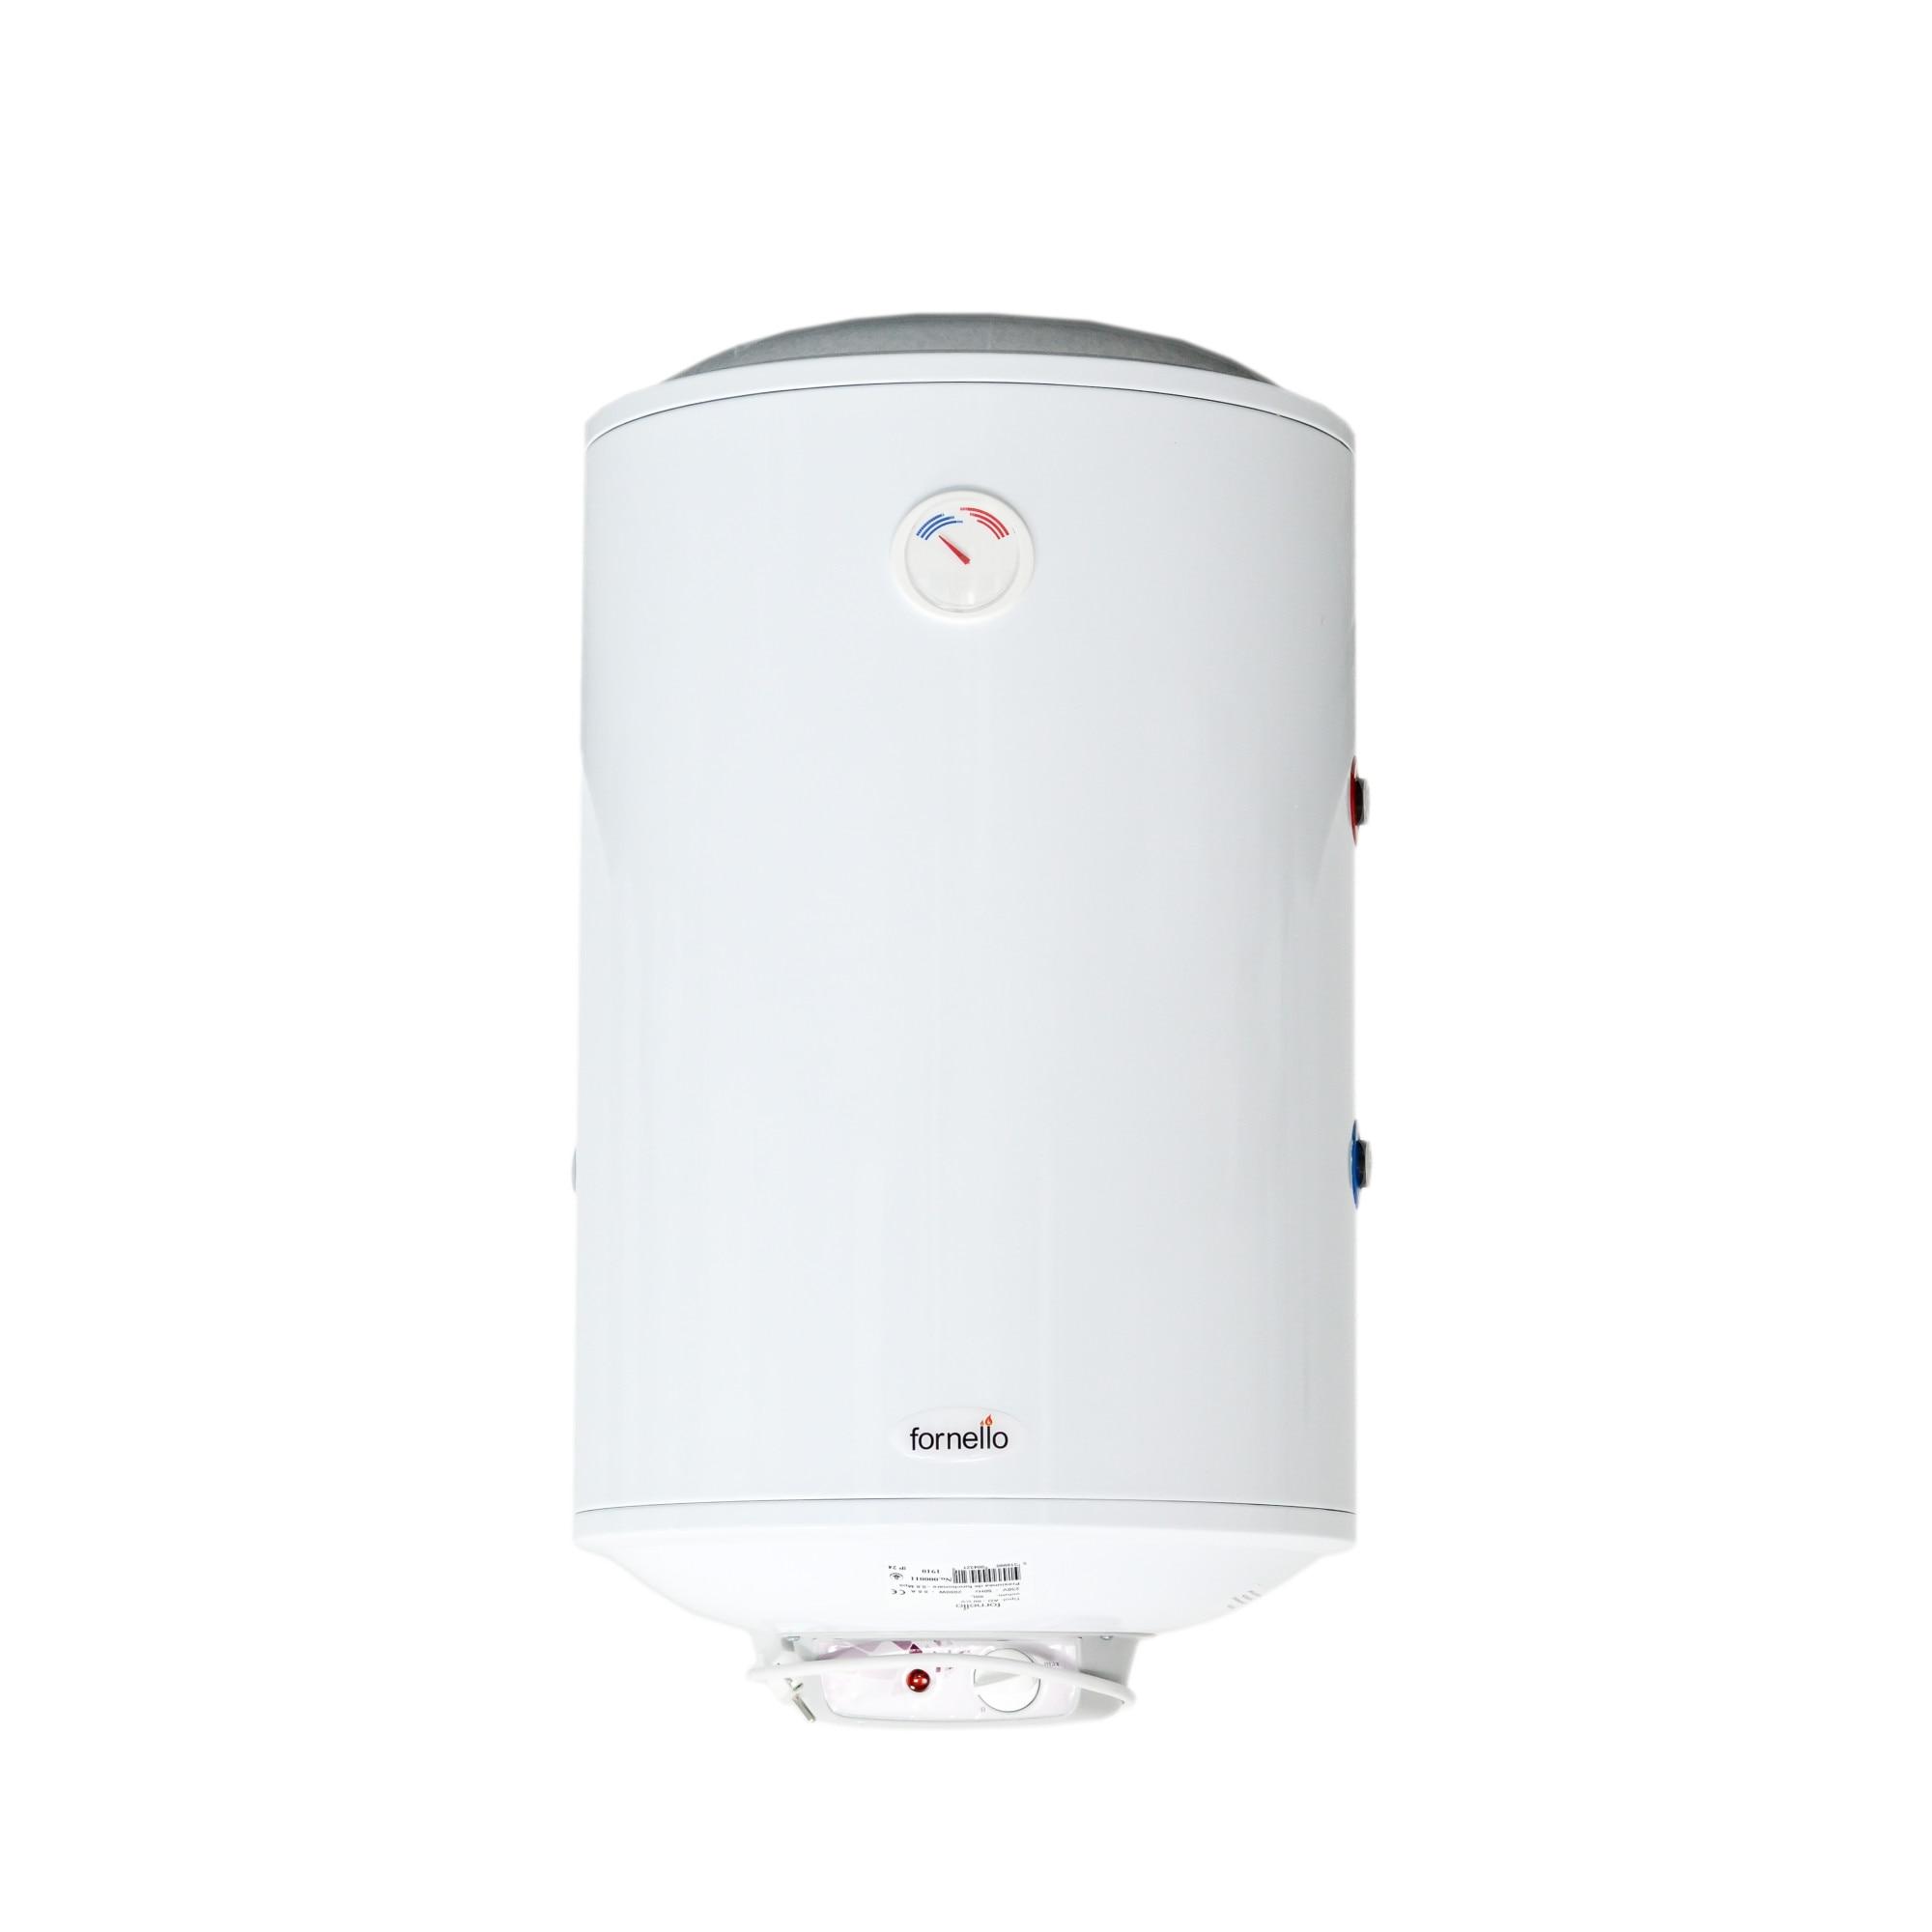 Fotografie Boiler termoelectric Fornello Titanium Plus 2000 W, 100 l, 0.8 Mpa, racord stanga/dreapta